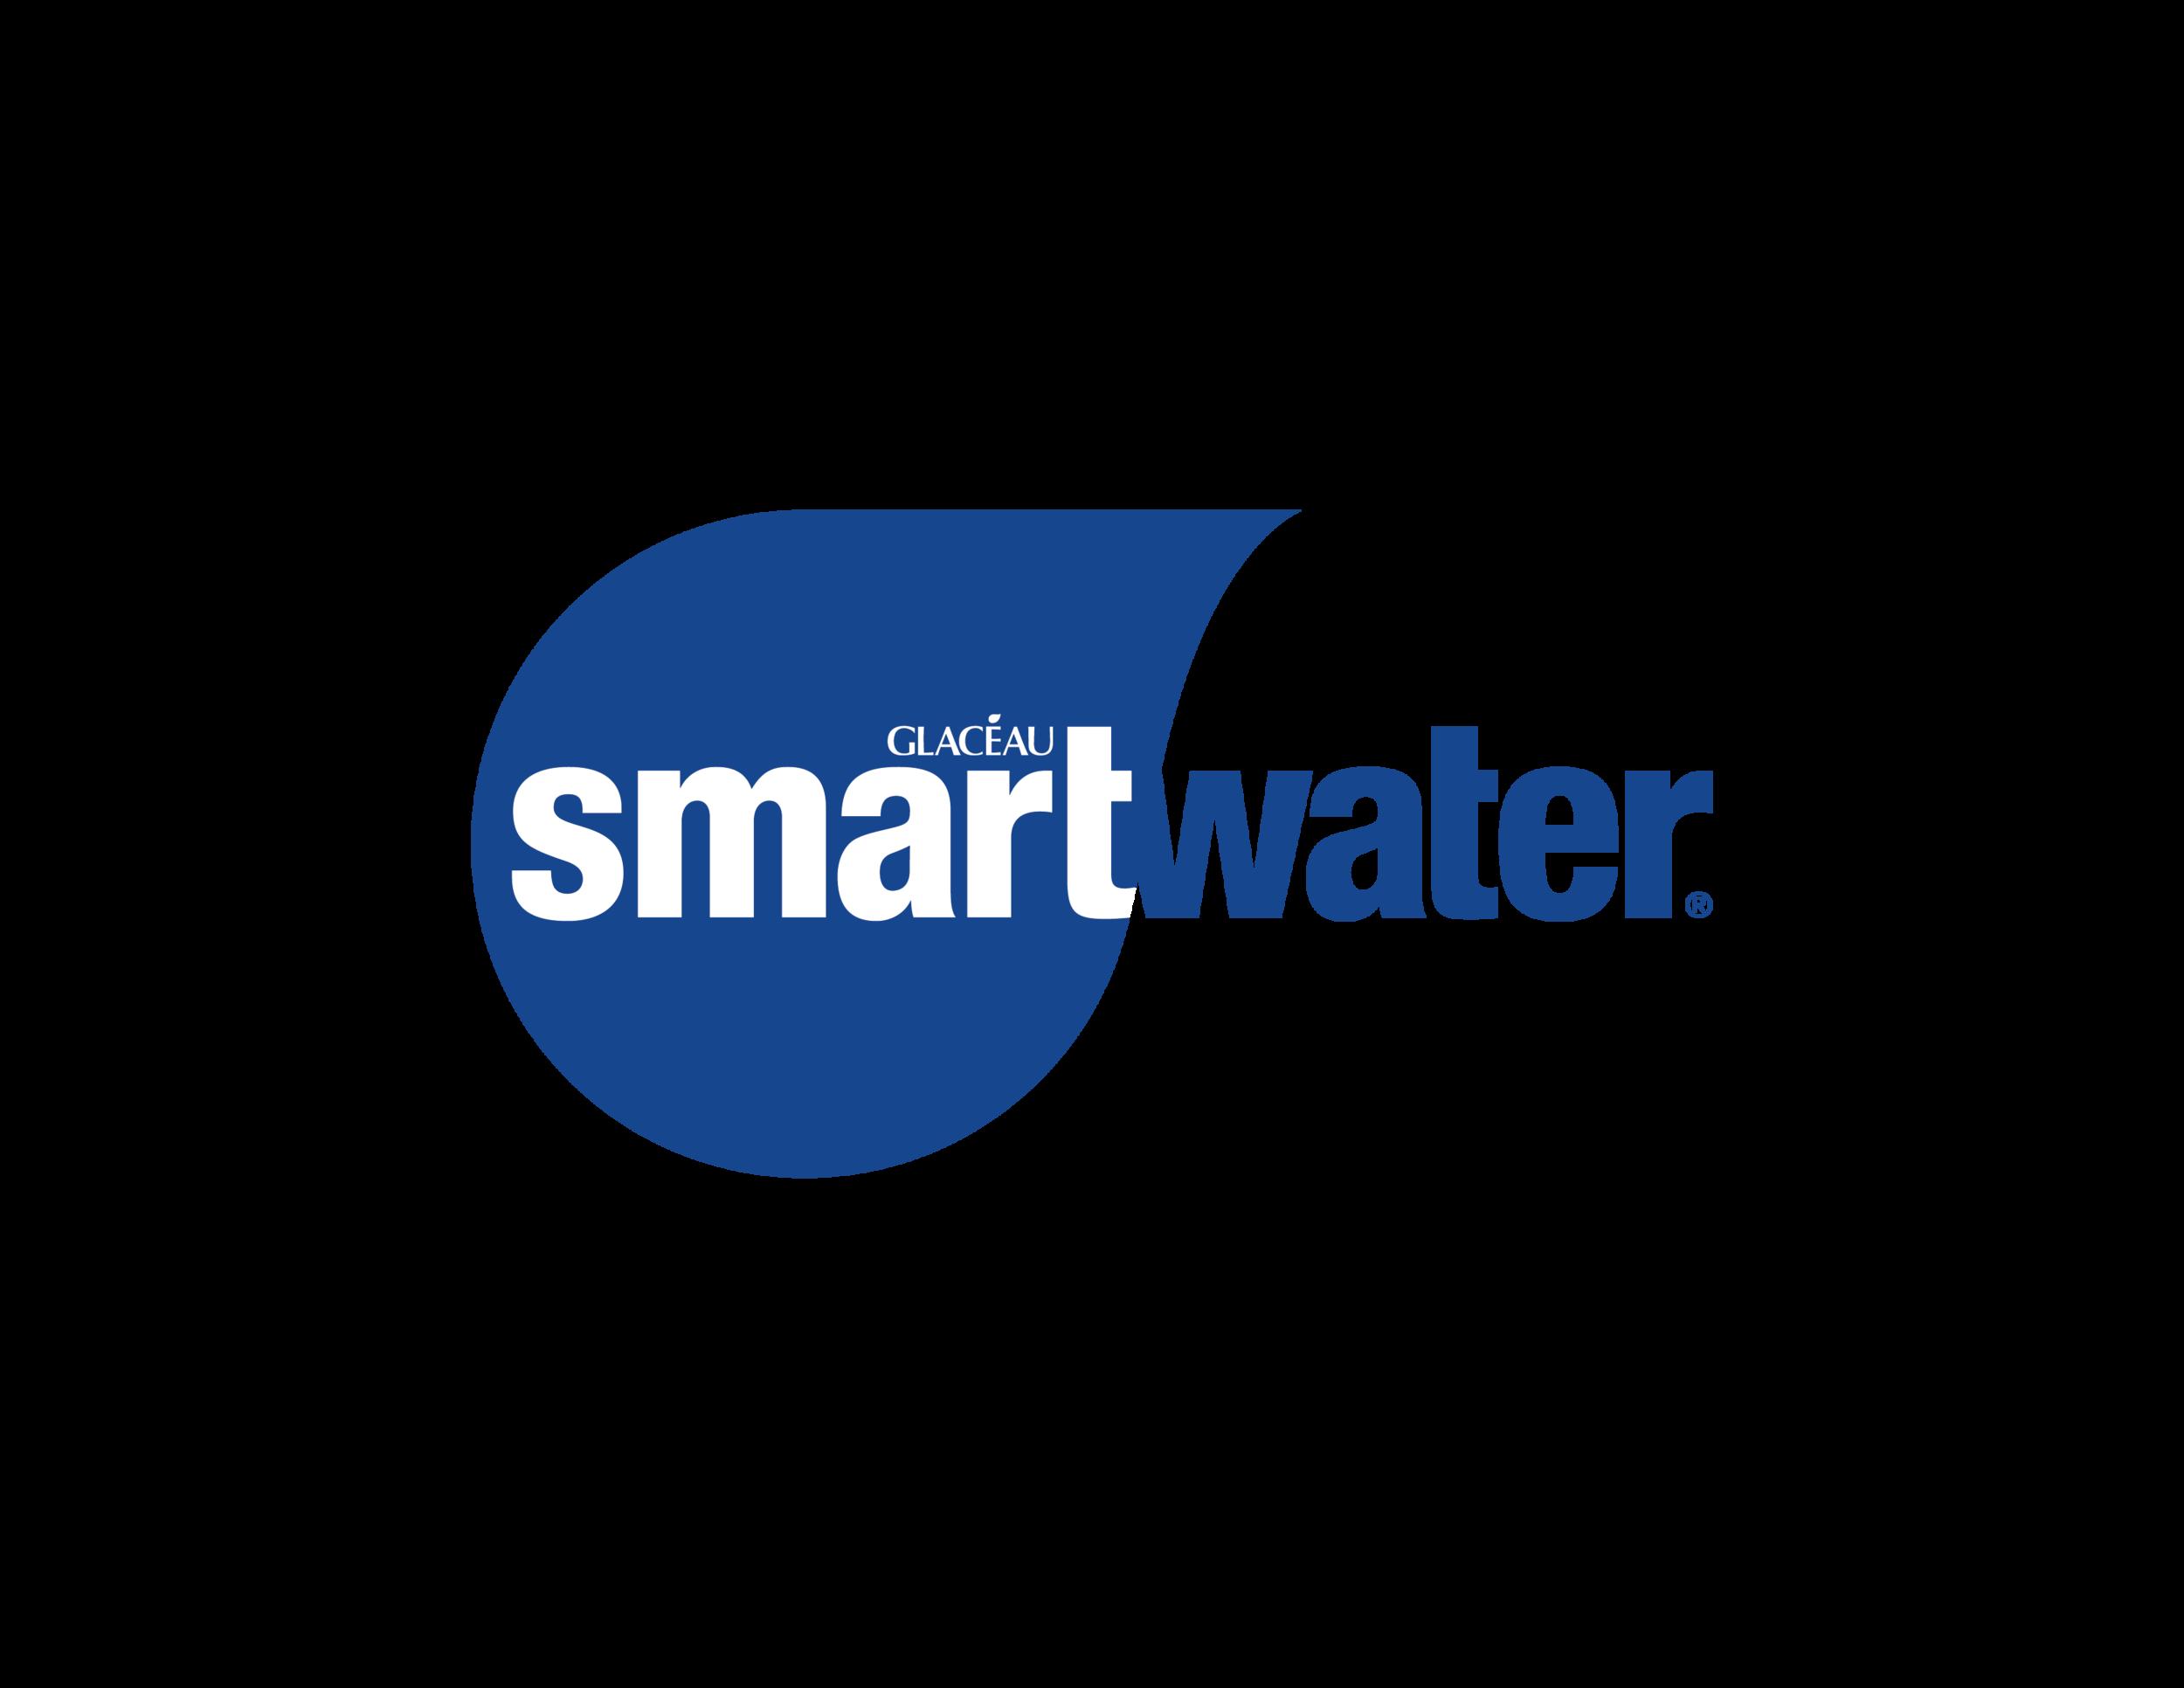 smartwaterLogo_Blue-01.png